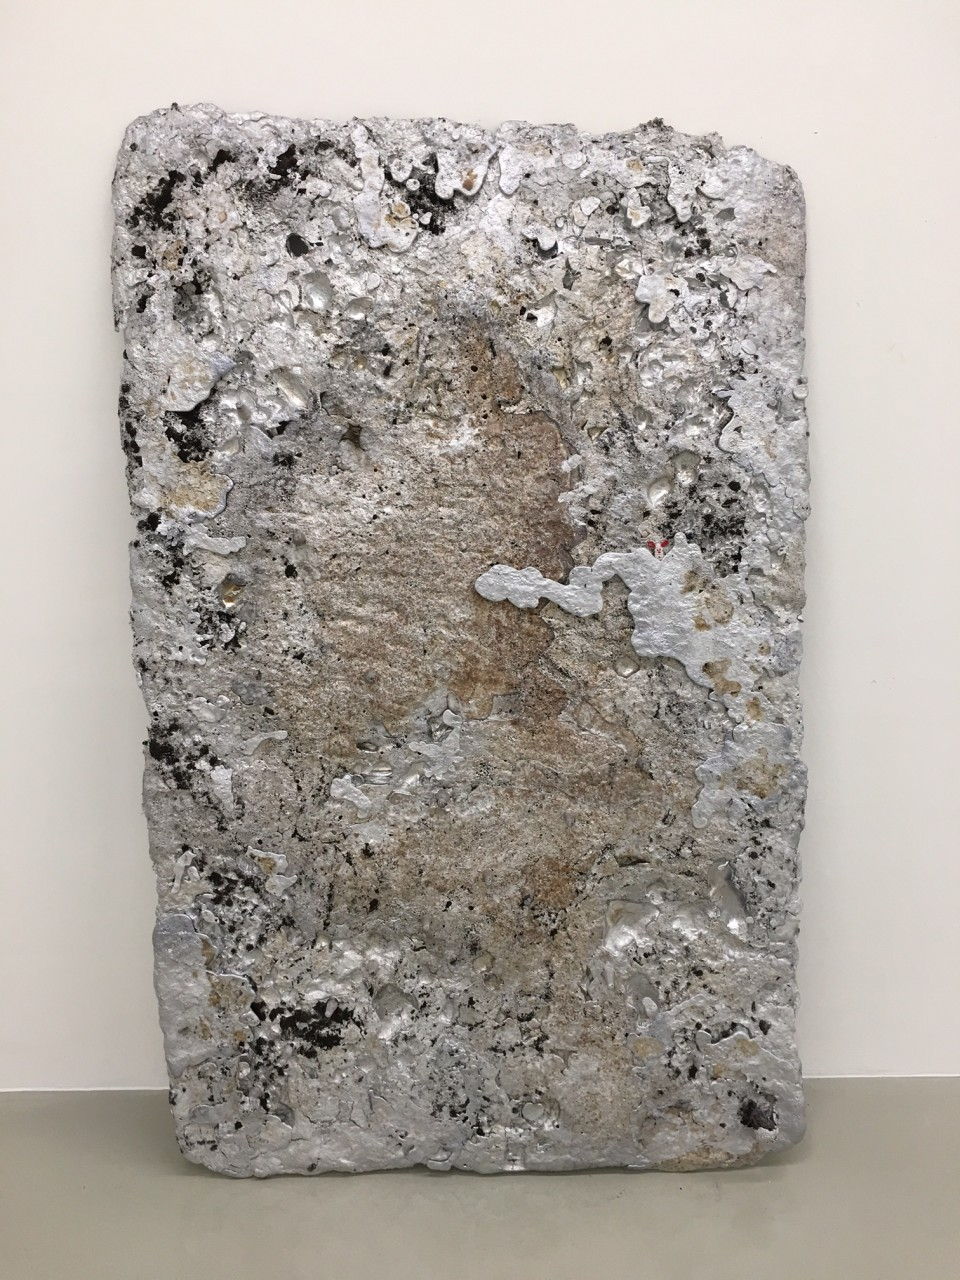 AL Land, 2016  Aluminium, Sand, Pearls  124 x 194 x 7 cm 48 7/8 x 76 3/8 x 2 3/4 in